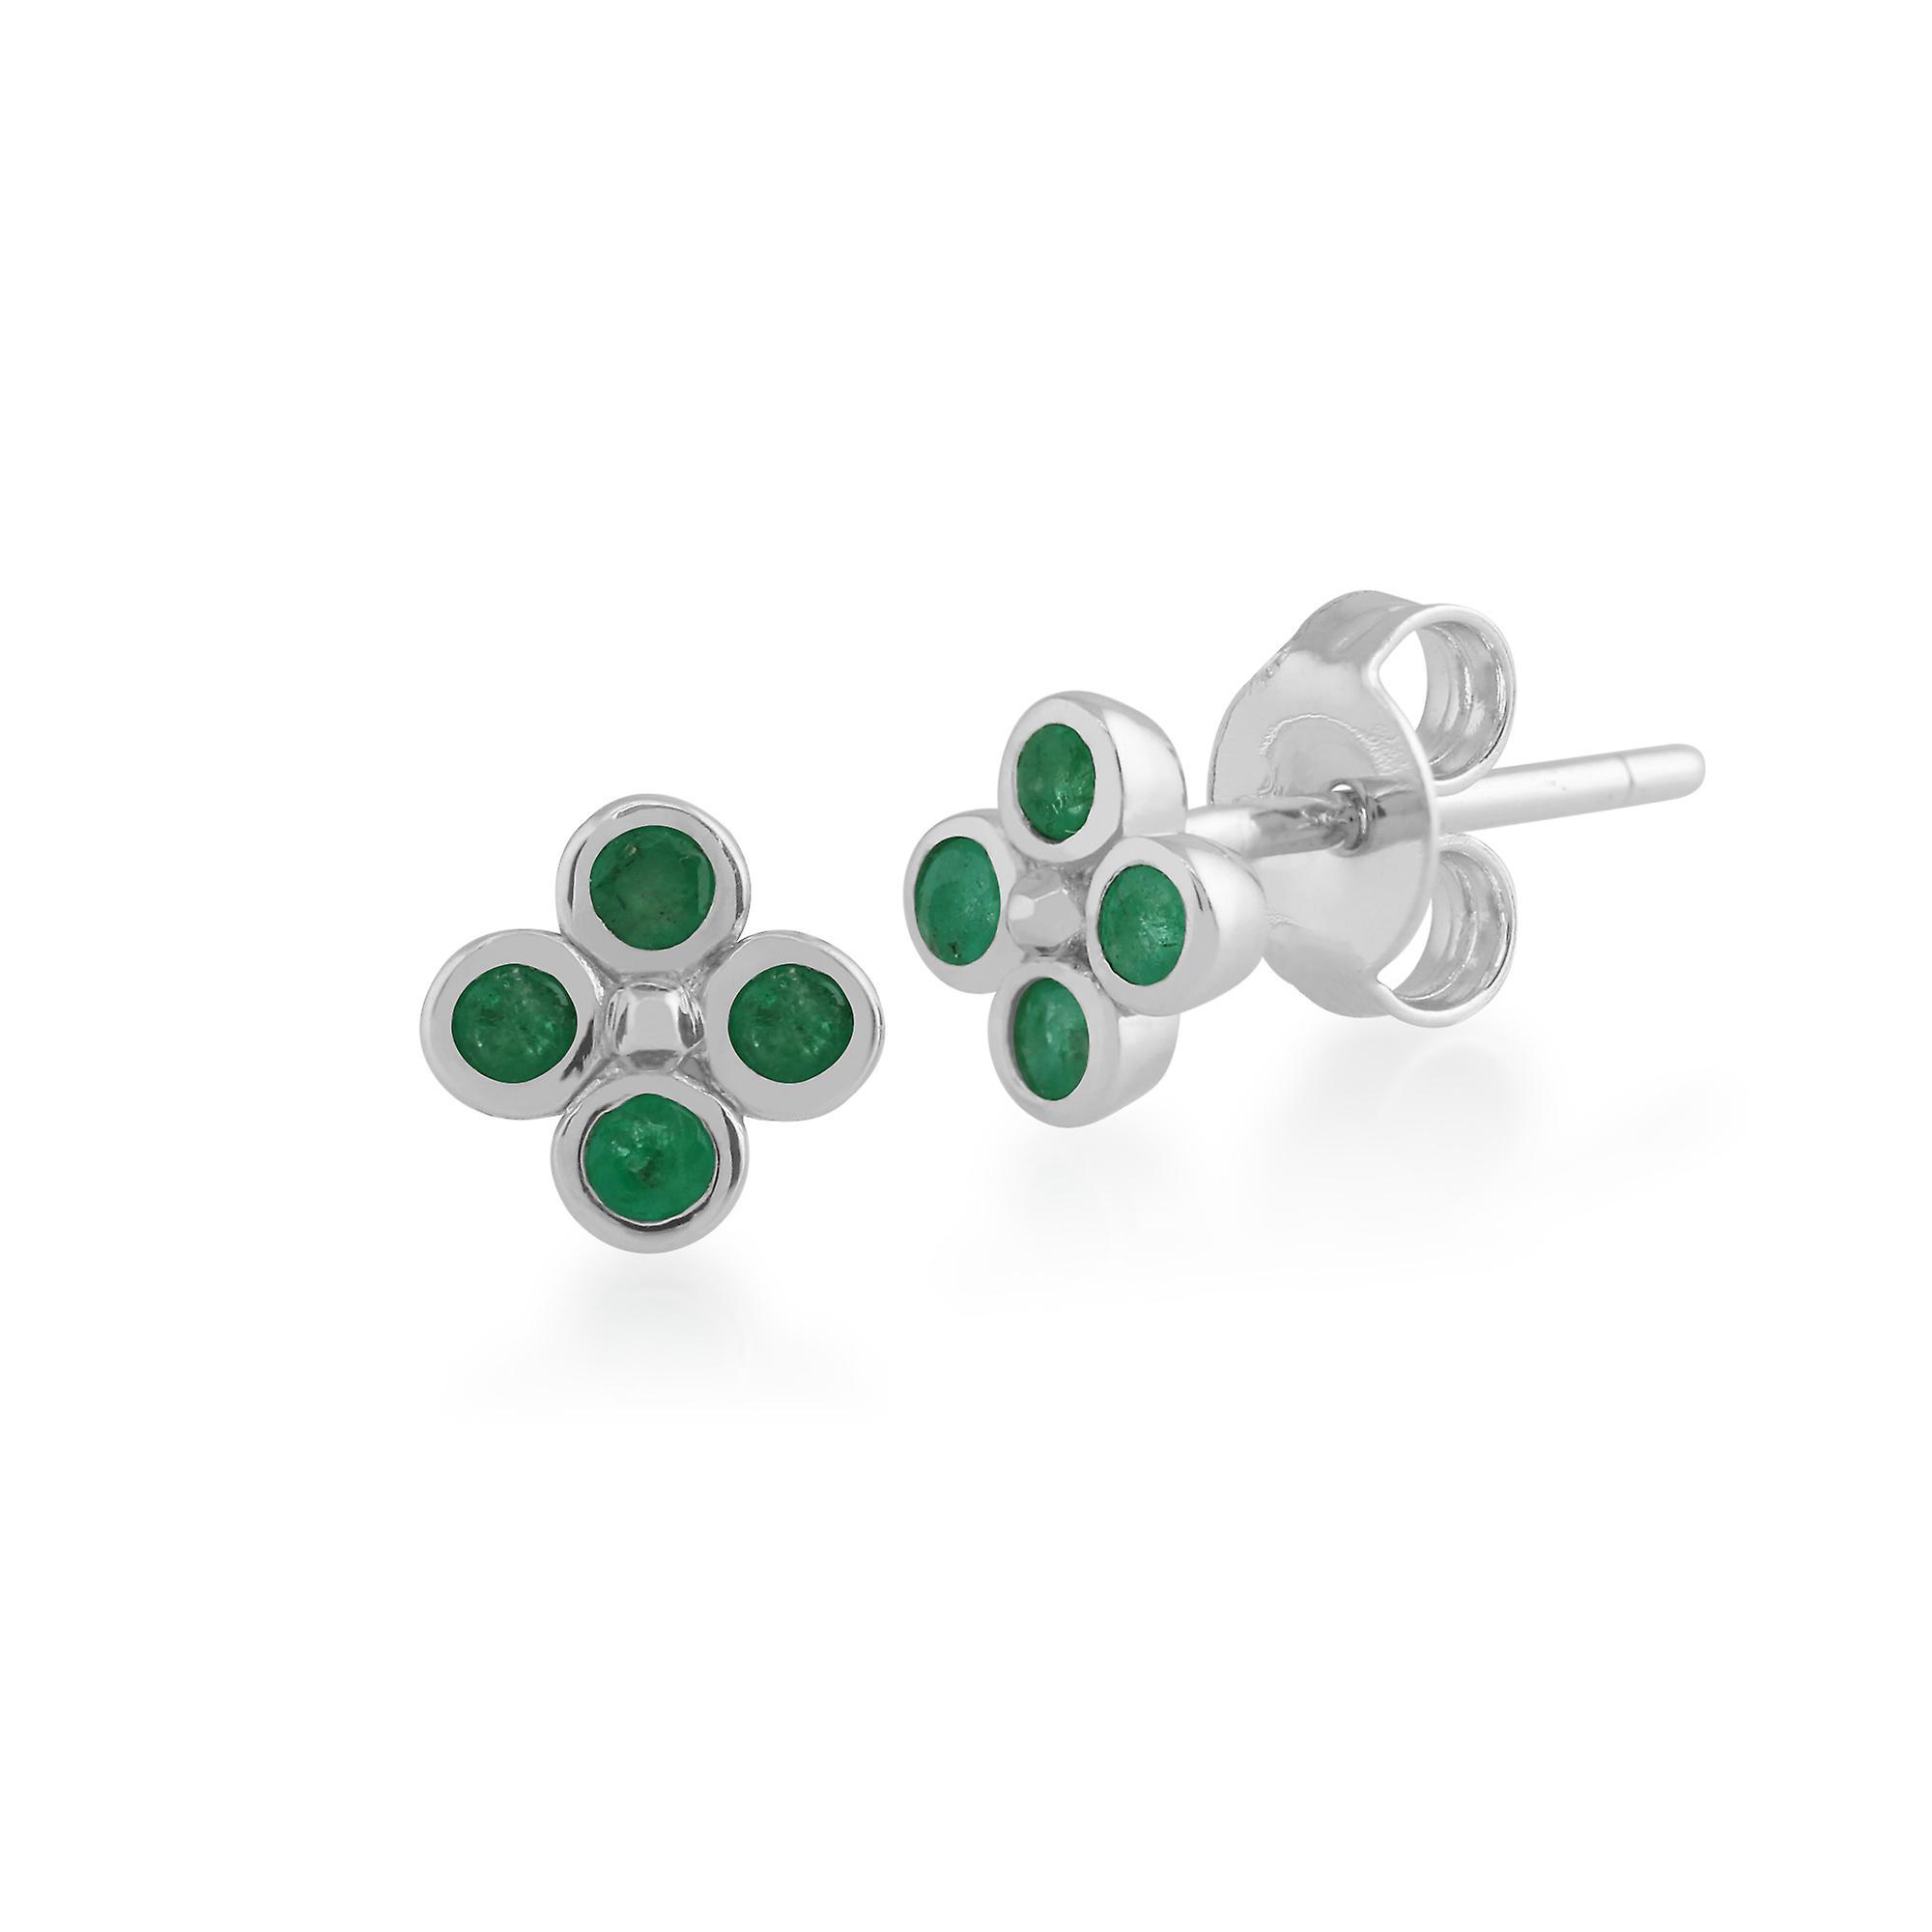 Gemondo Sterling Silver Emerald Cluster Stud Earrings & Ring Set